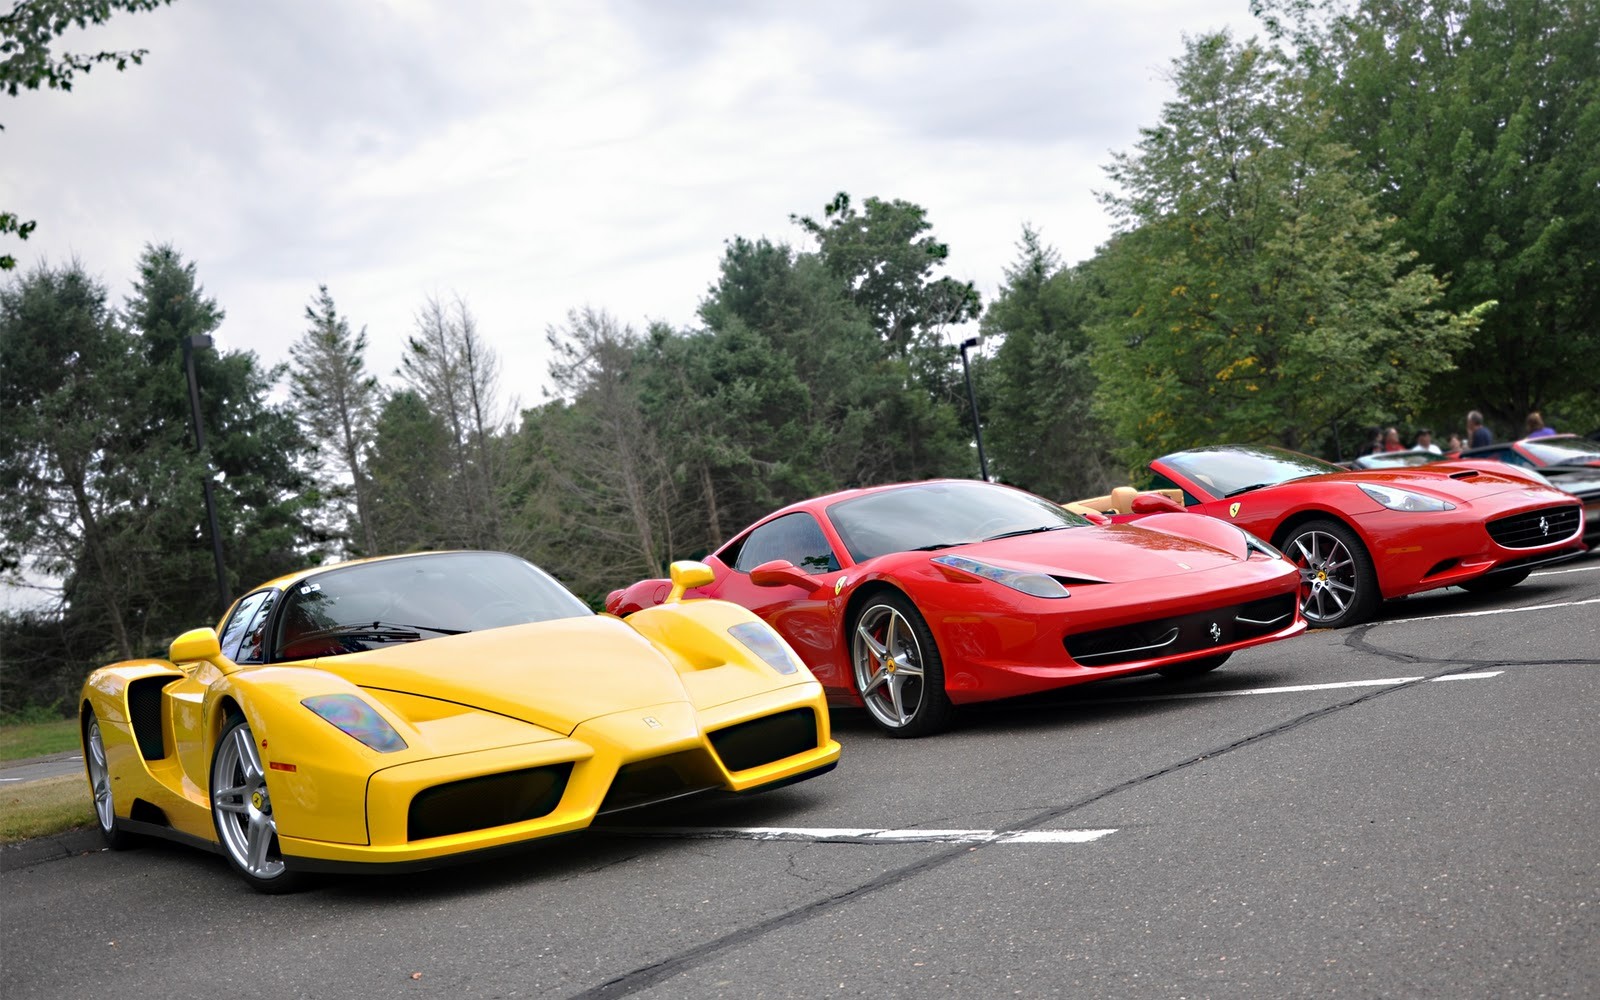 http://4.bp.blogspot.com/-Jfju6Ge_imk/TvhLYxorb5I/AAAAAAAACwM/J6UHlI3SkH0/s1600/Ferrari+Enzo+wallpaper+%2528thewallpaperdb.blogspot.com%2529+%25285%2529.jpg